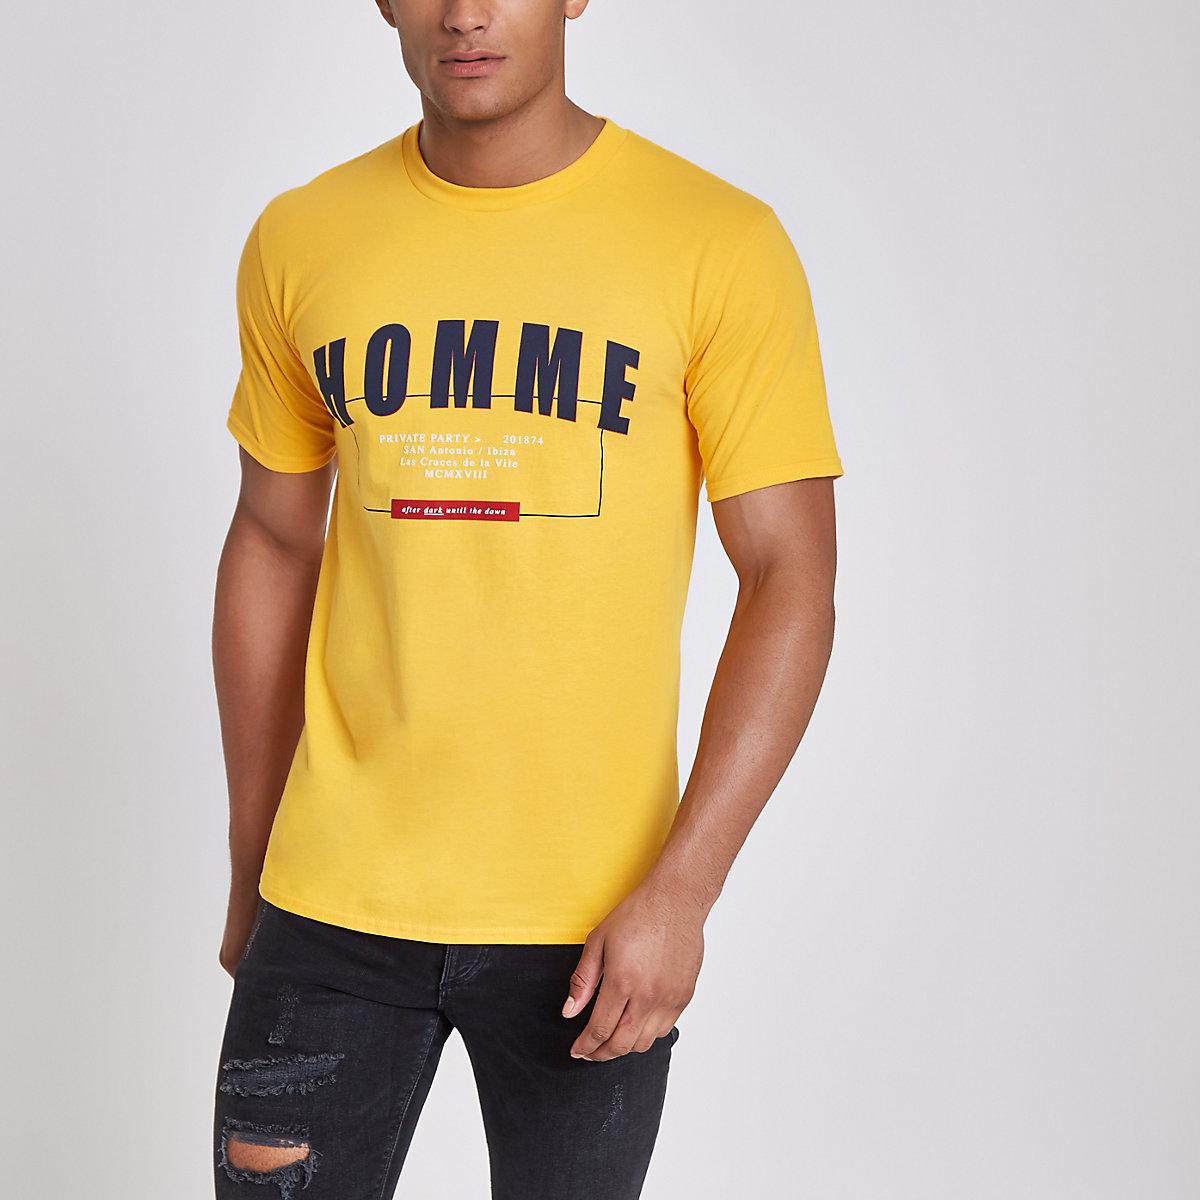 Yellow 'homme' short sleeve T-shirt